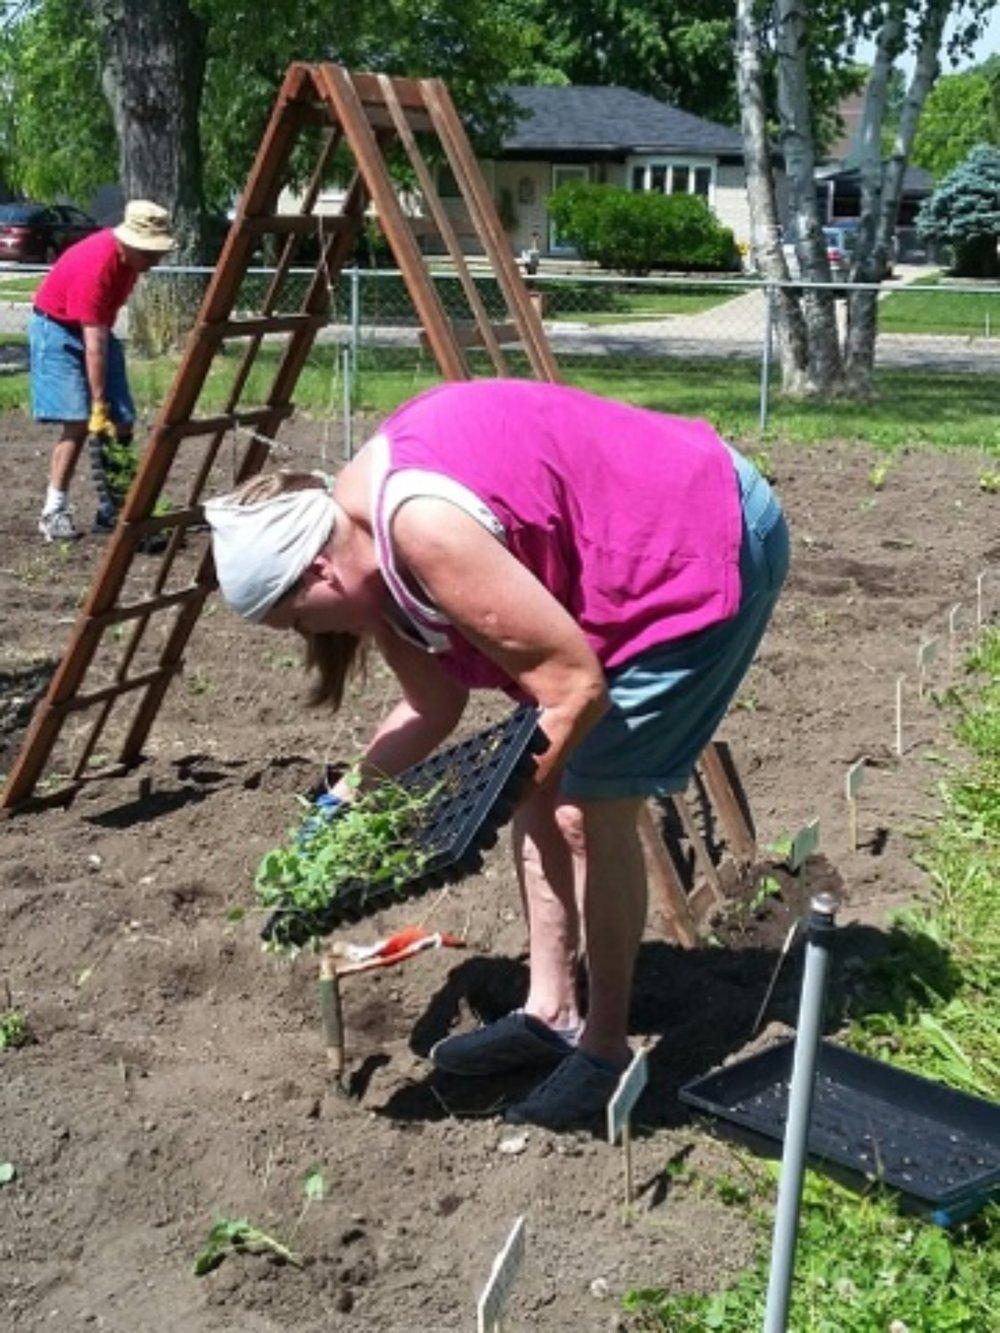 sppc_gardening_02.jpg